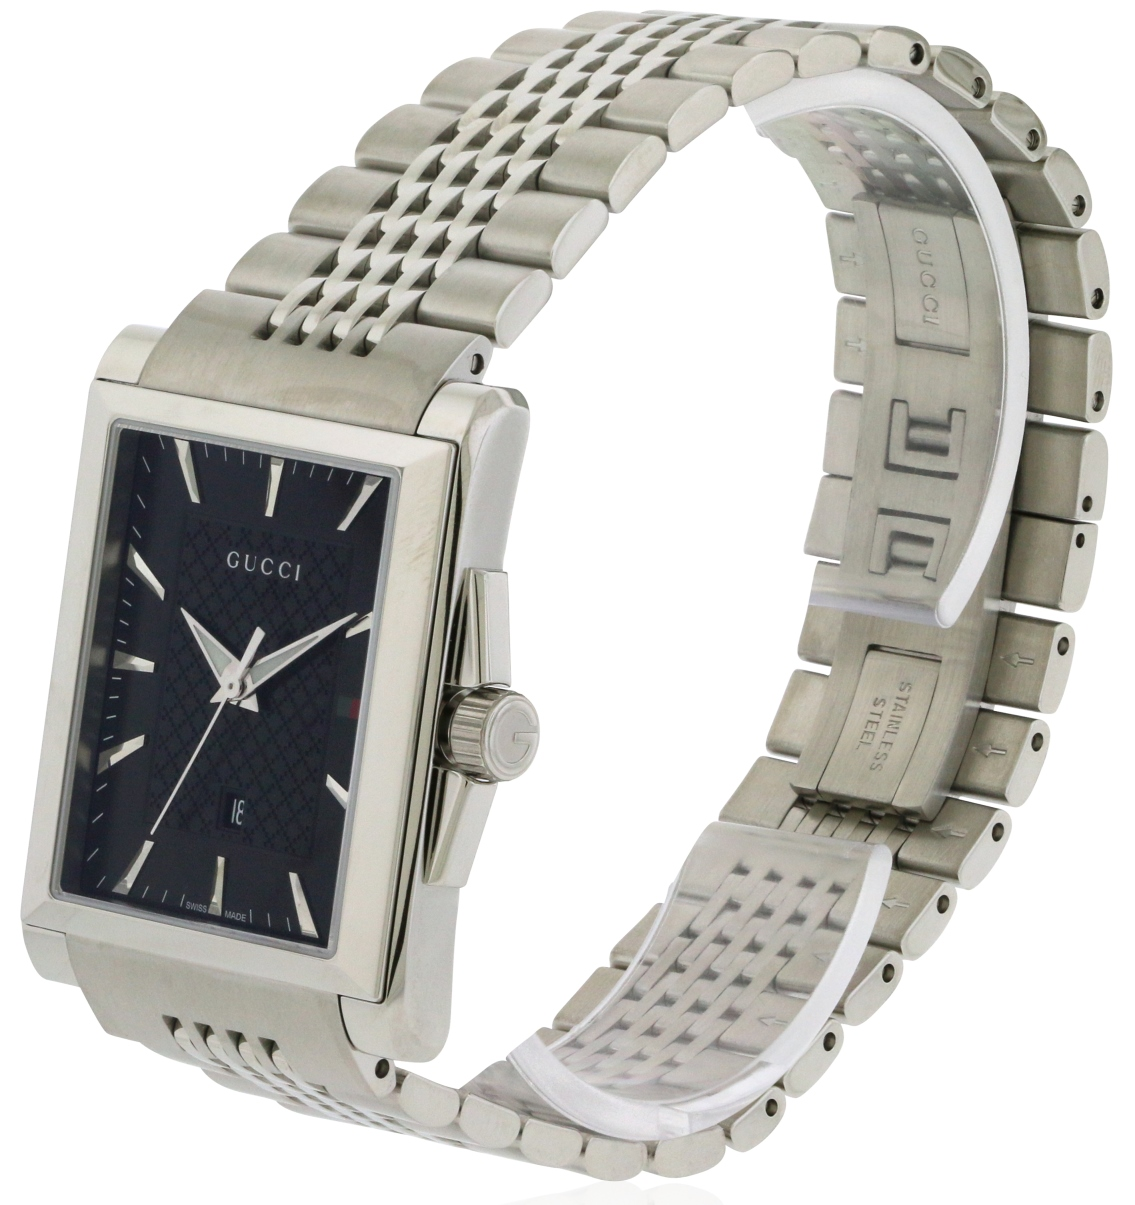 ffb3865e0e9 Gucci G-Timeless Mens Watch YA138401